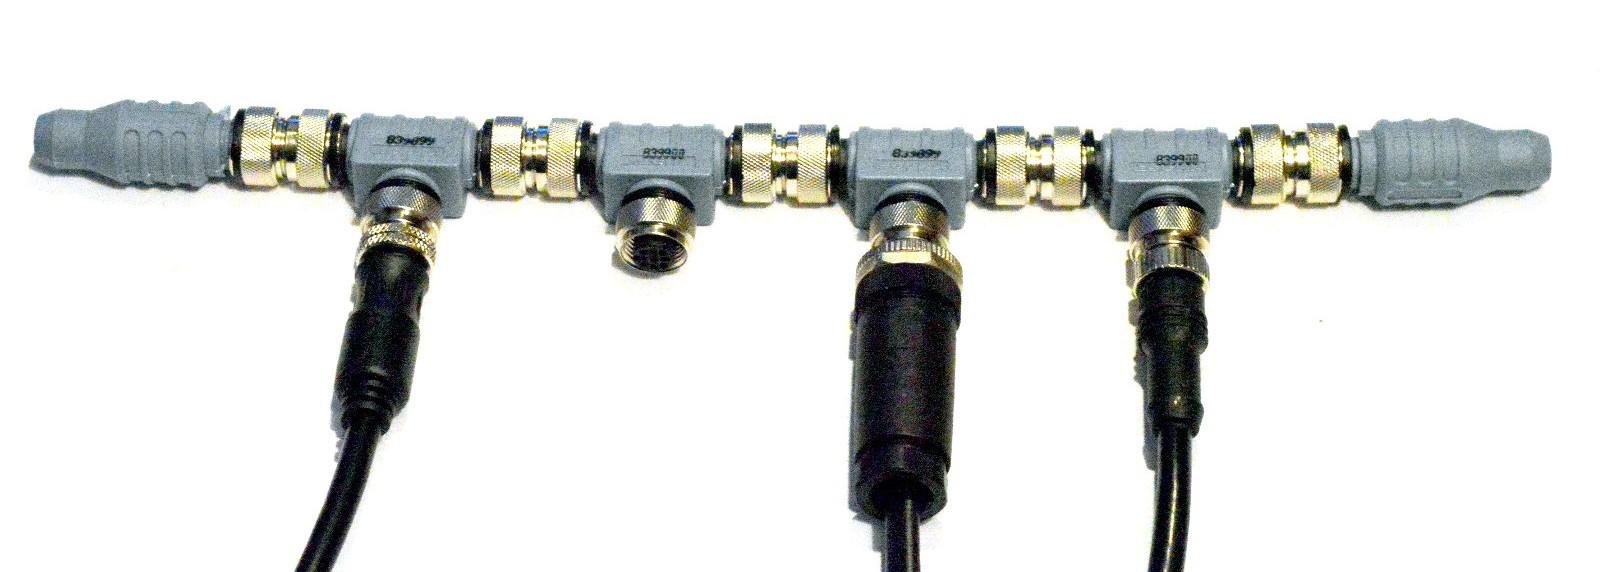 NMEA2000 Backbone